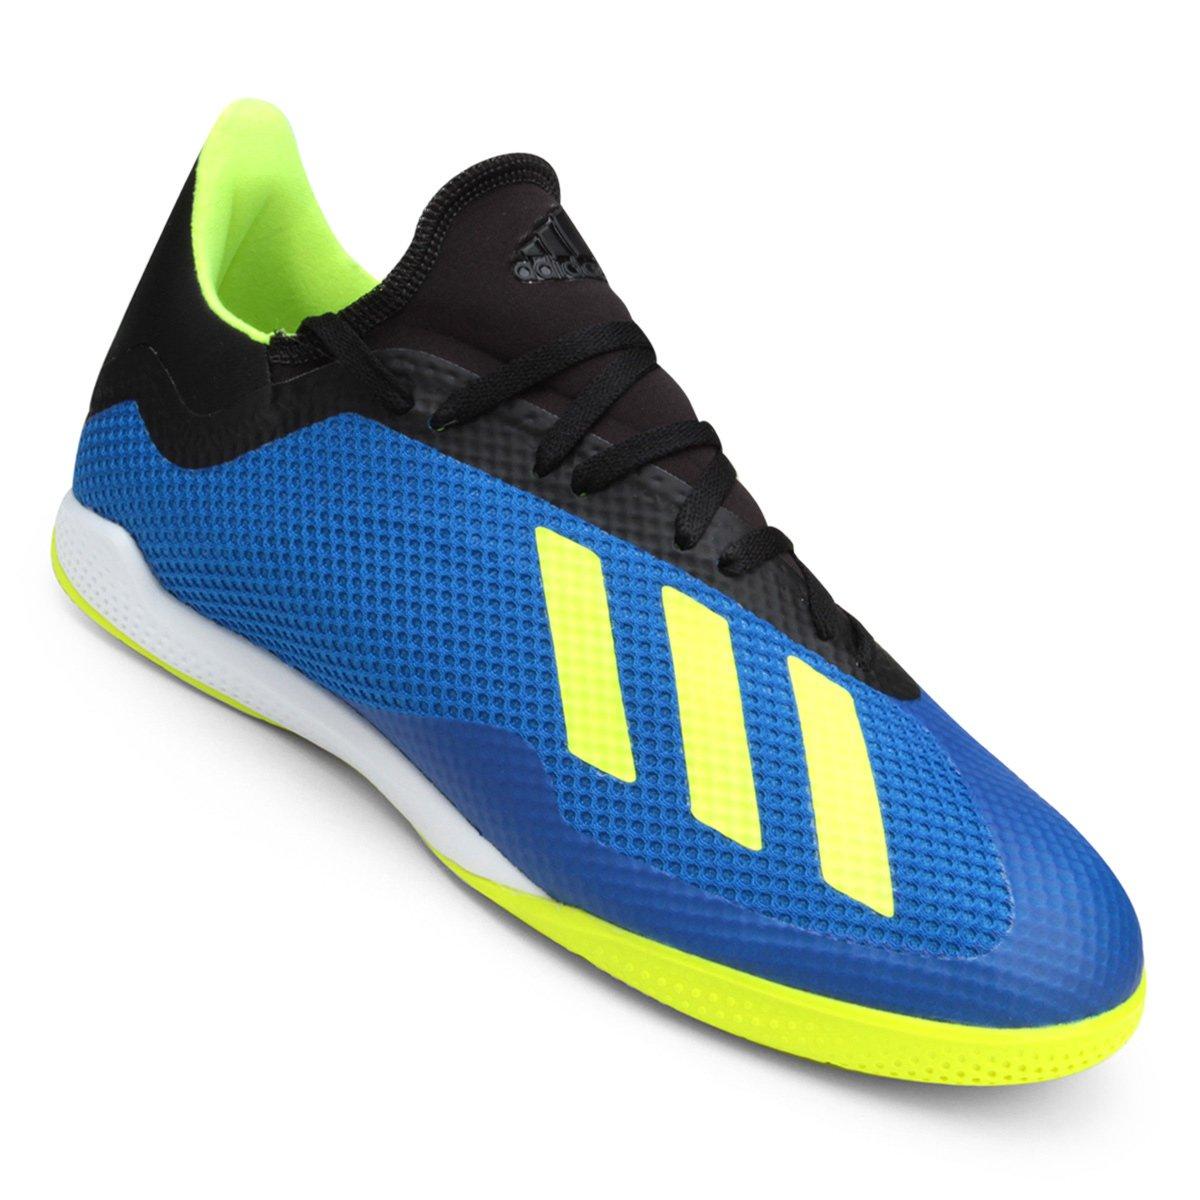 cfa4956314 Chuteira Futsal Adidas X Tango 18 3 IN - Azul e amarelo